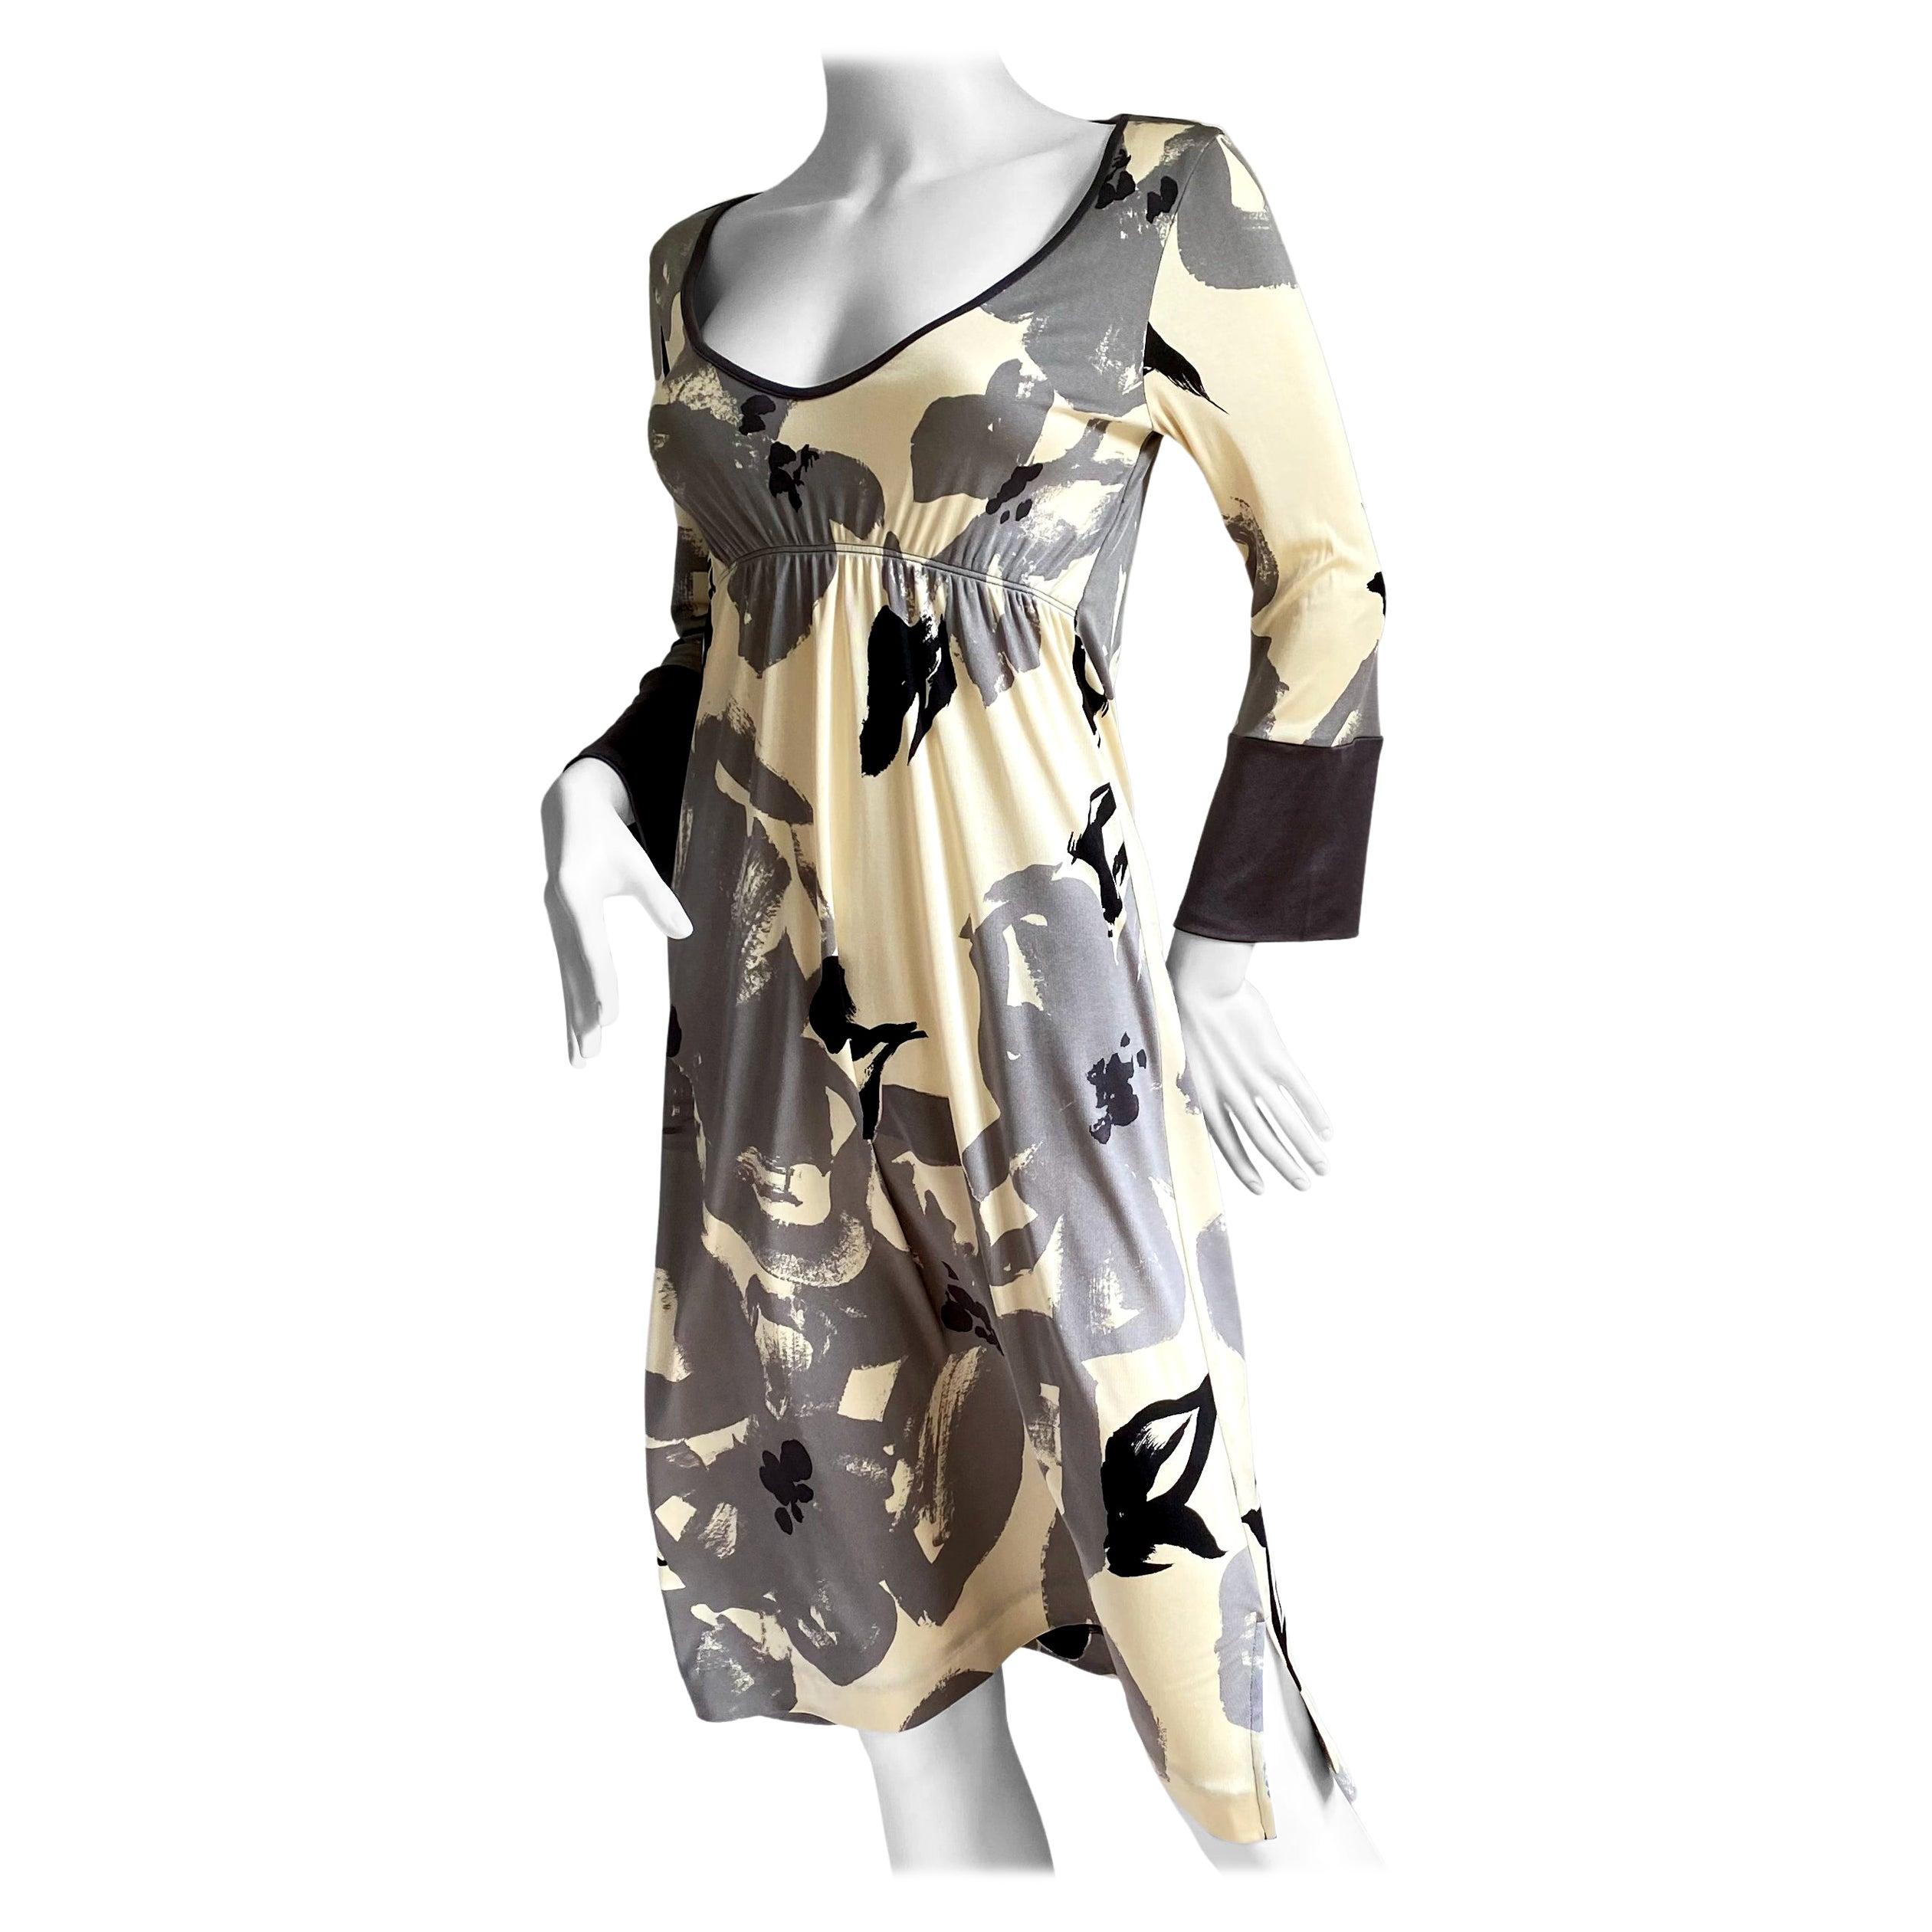 Neutral Floral NWT ethereal silk kimono dress - FLORA KUNG